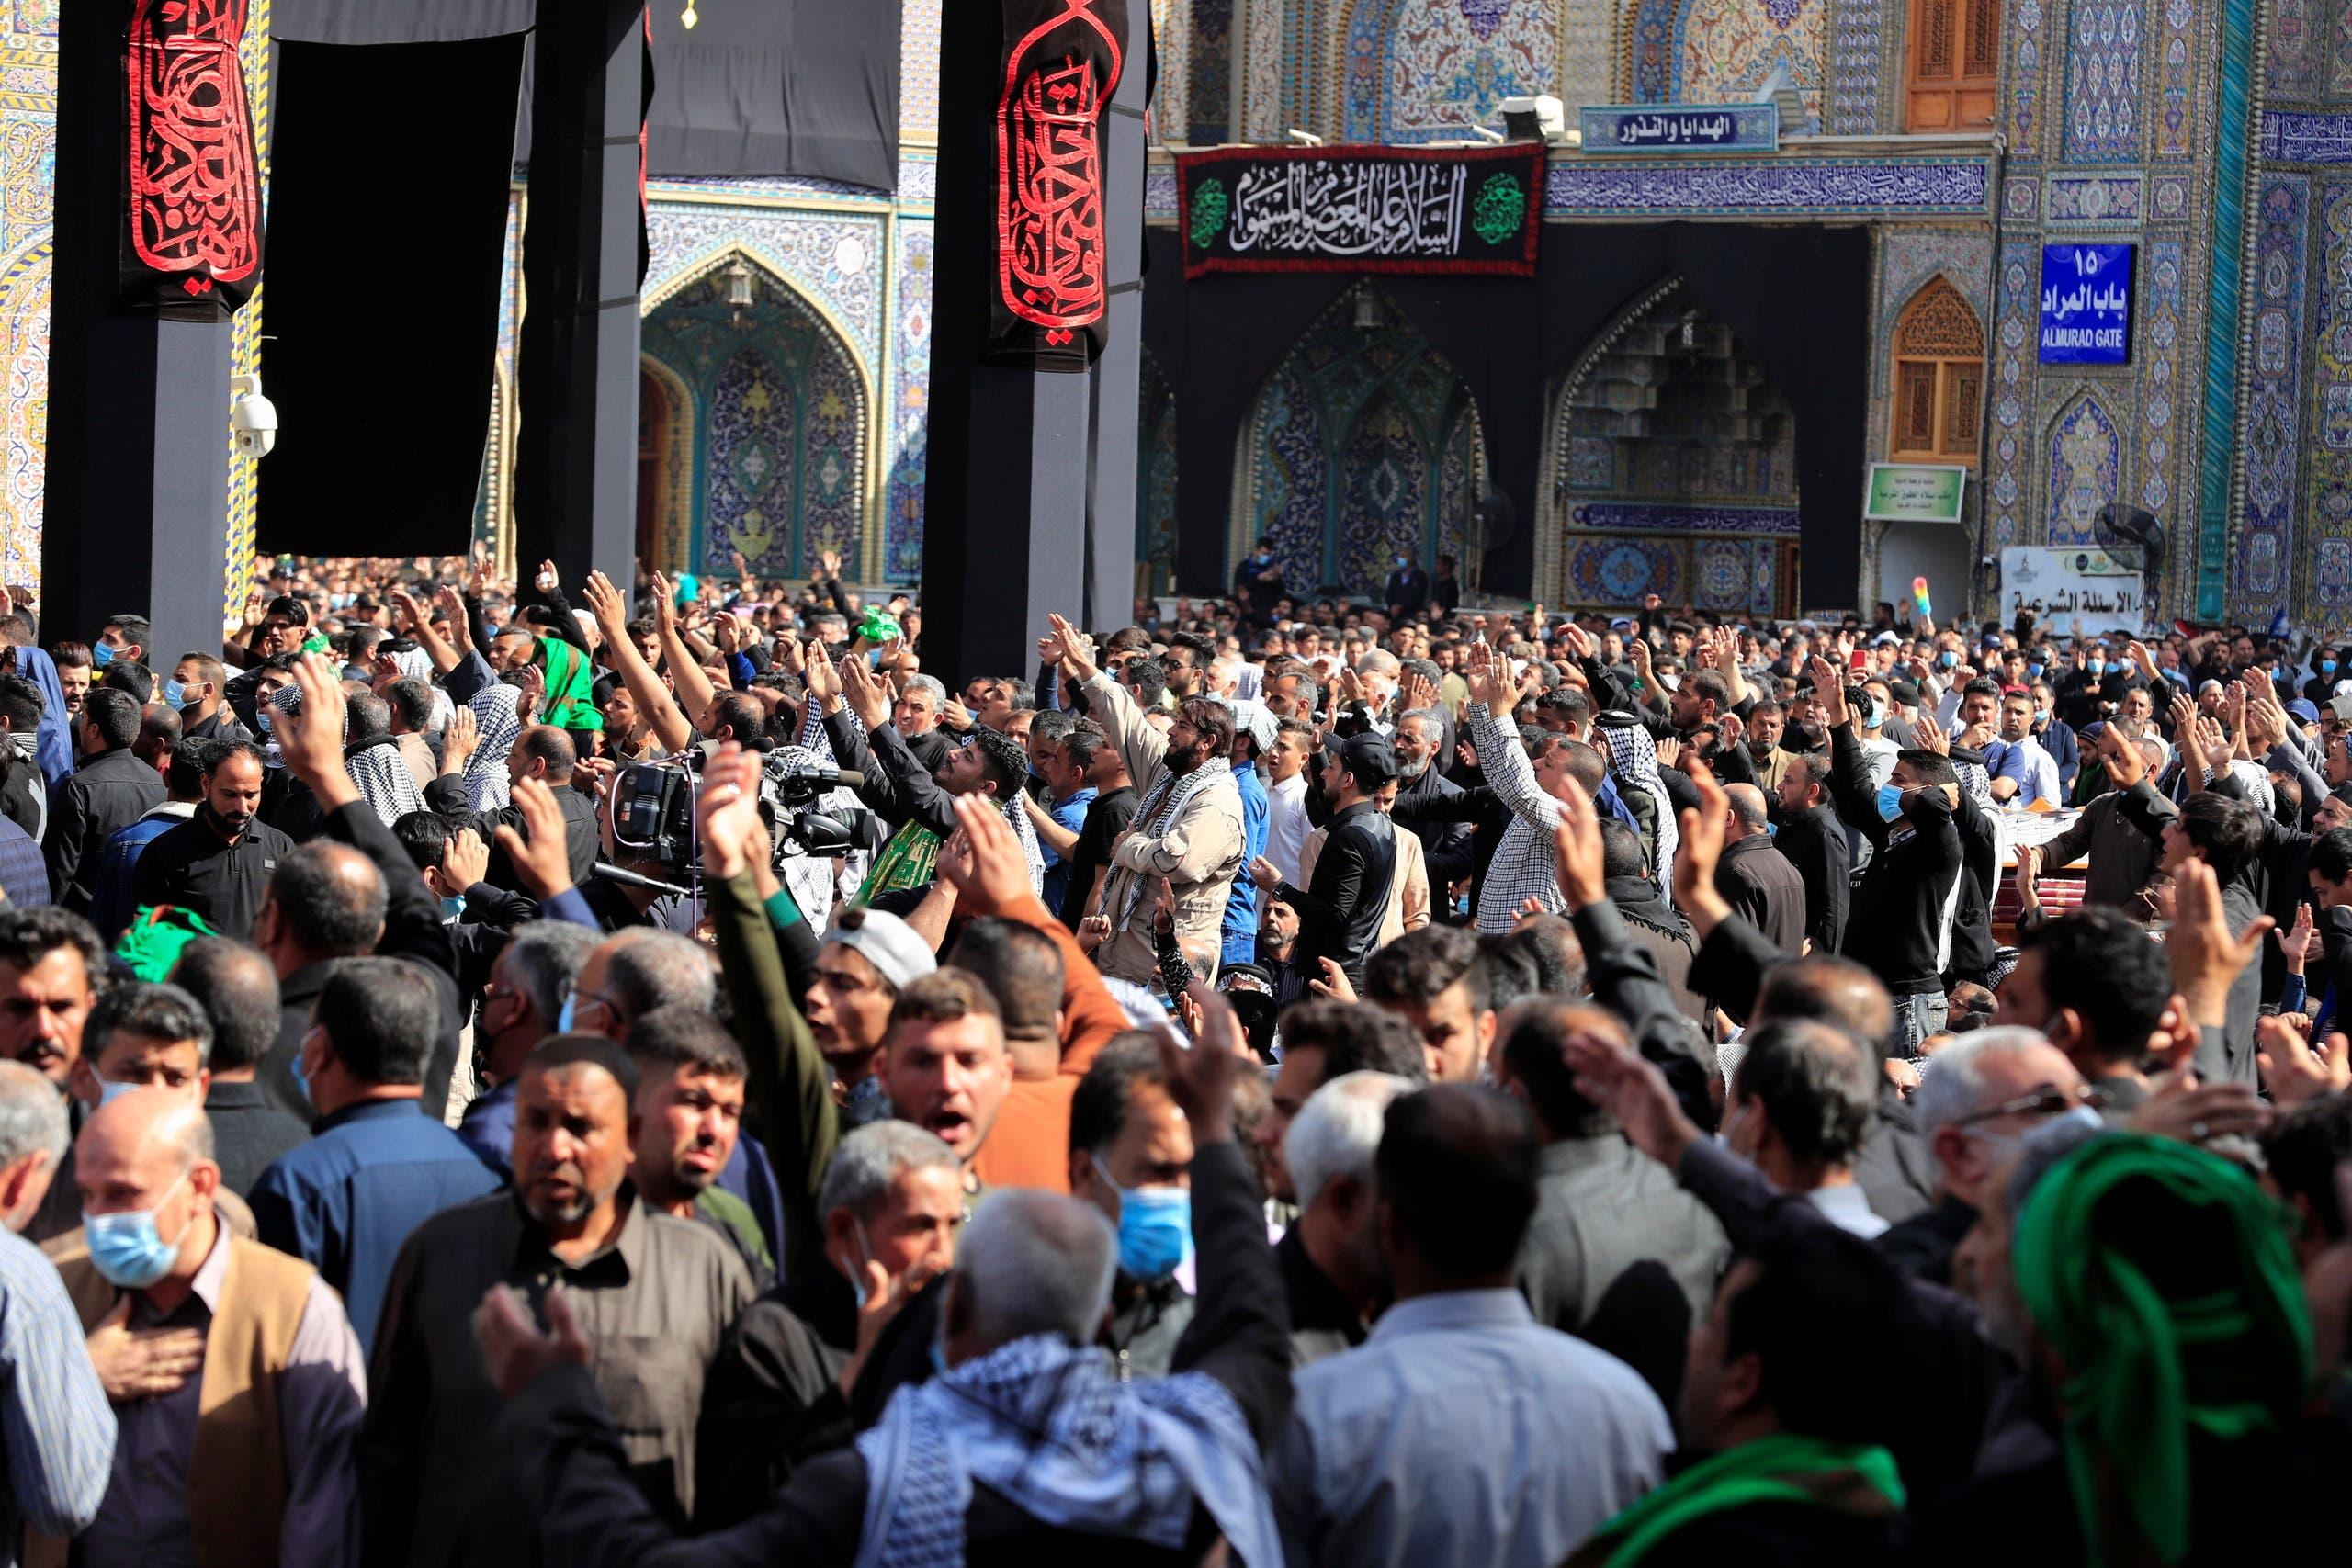 Shi'ite pilgrims gather at Imam Moussa al-Kadhim shrine to mark his death anniversary, amid the outbreak of the coronavirus disease (COVID-19), in Baghdad's Kadhimiya district, Iraq March 10, 2021. (Reuters)